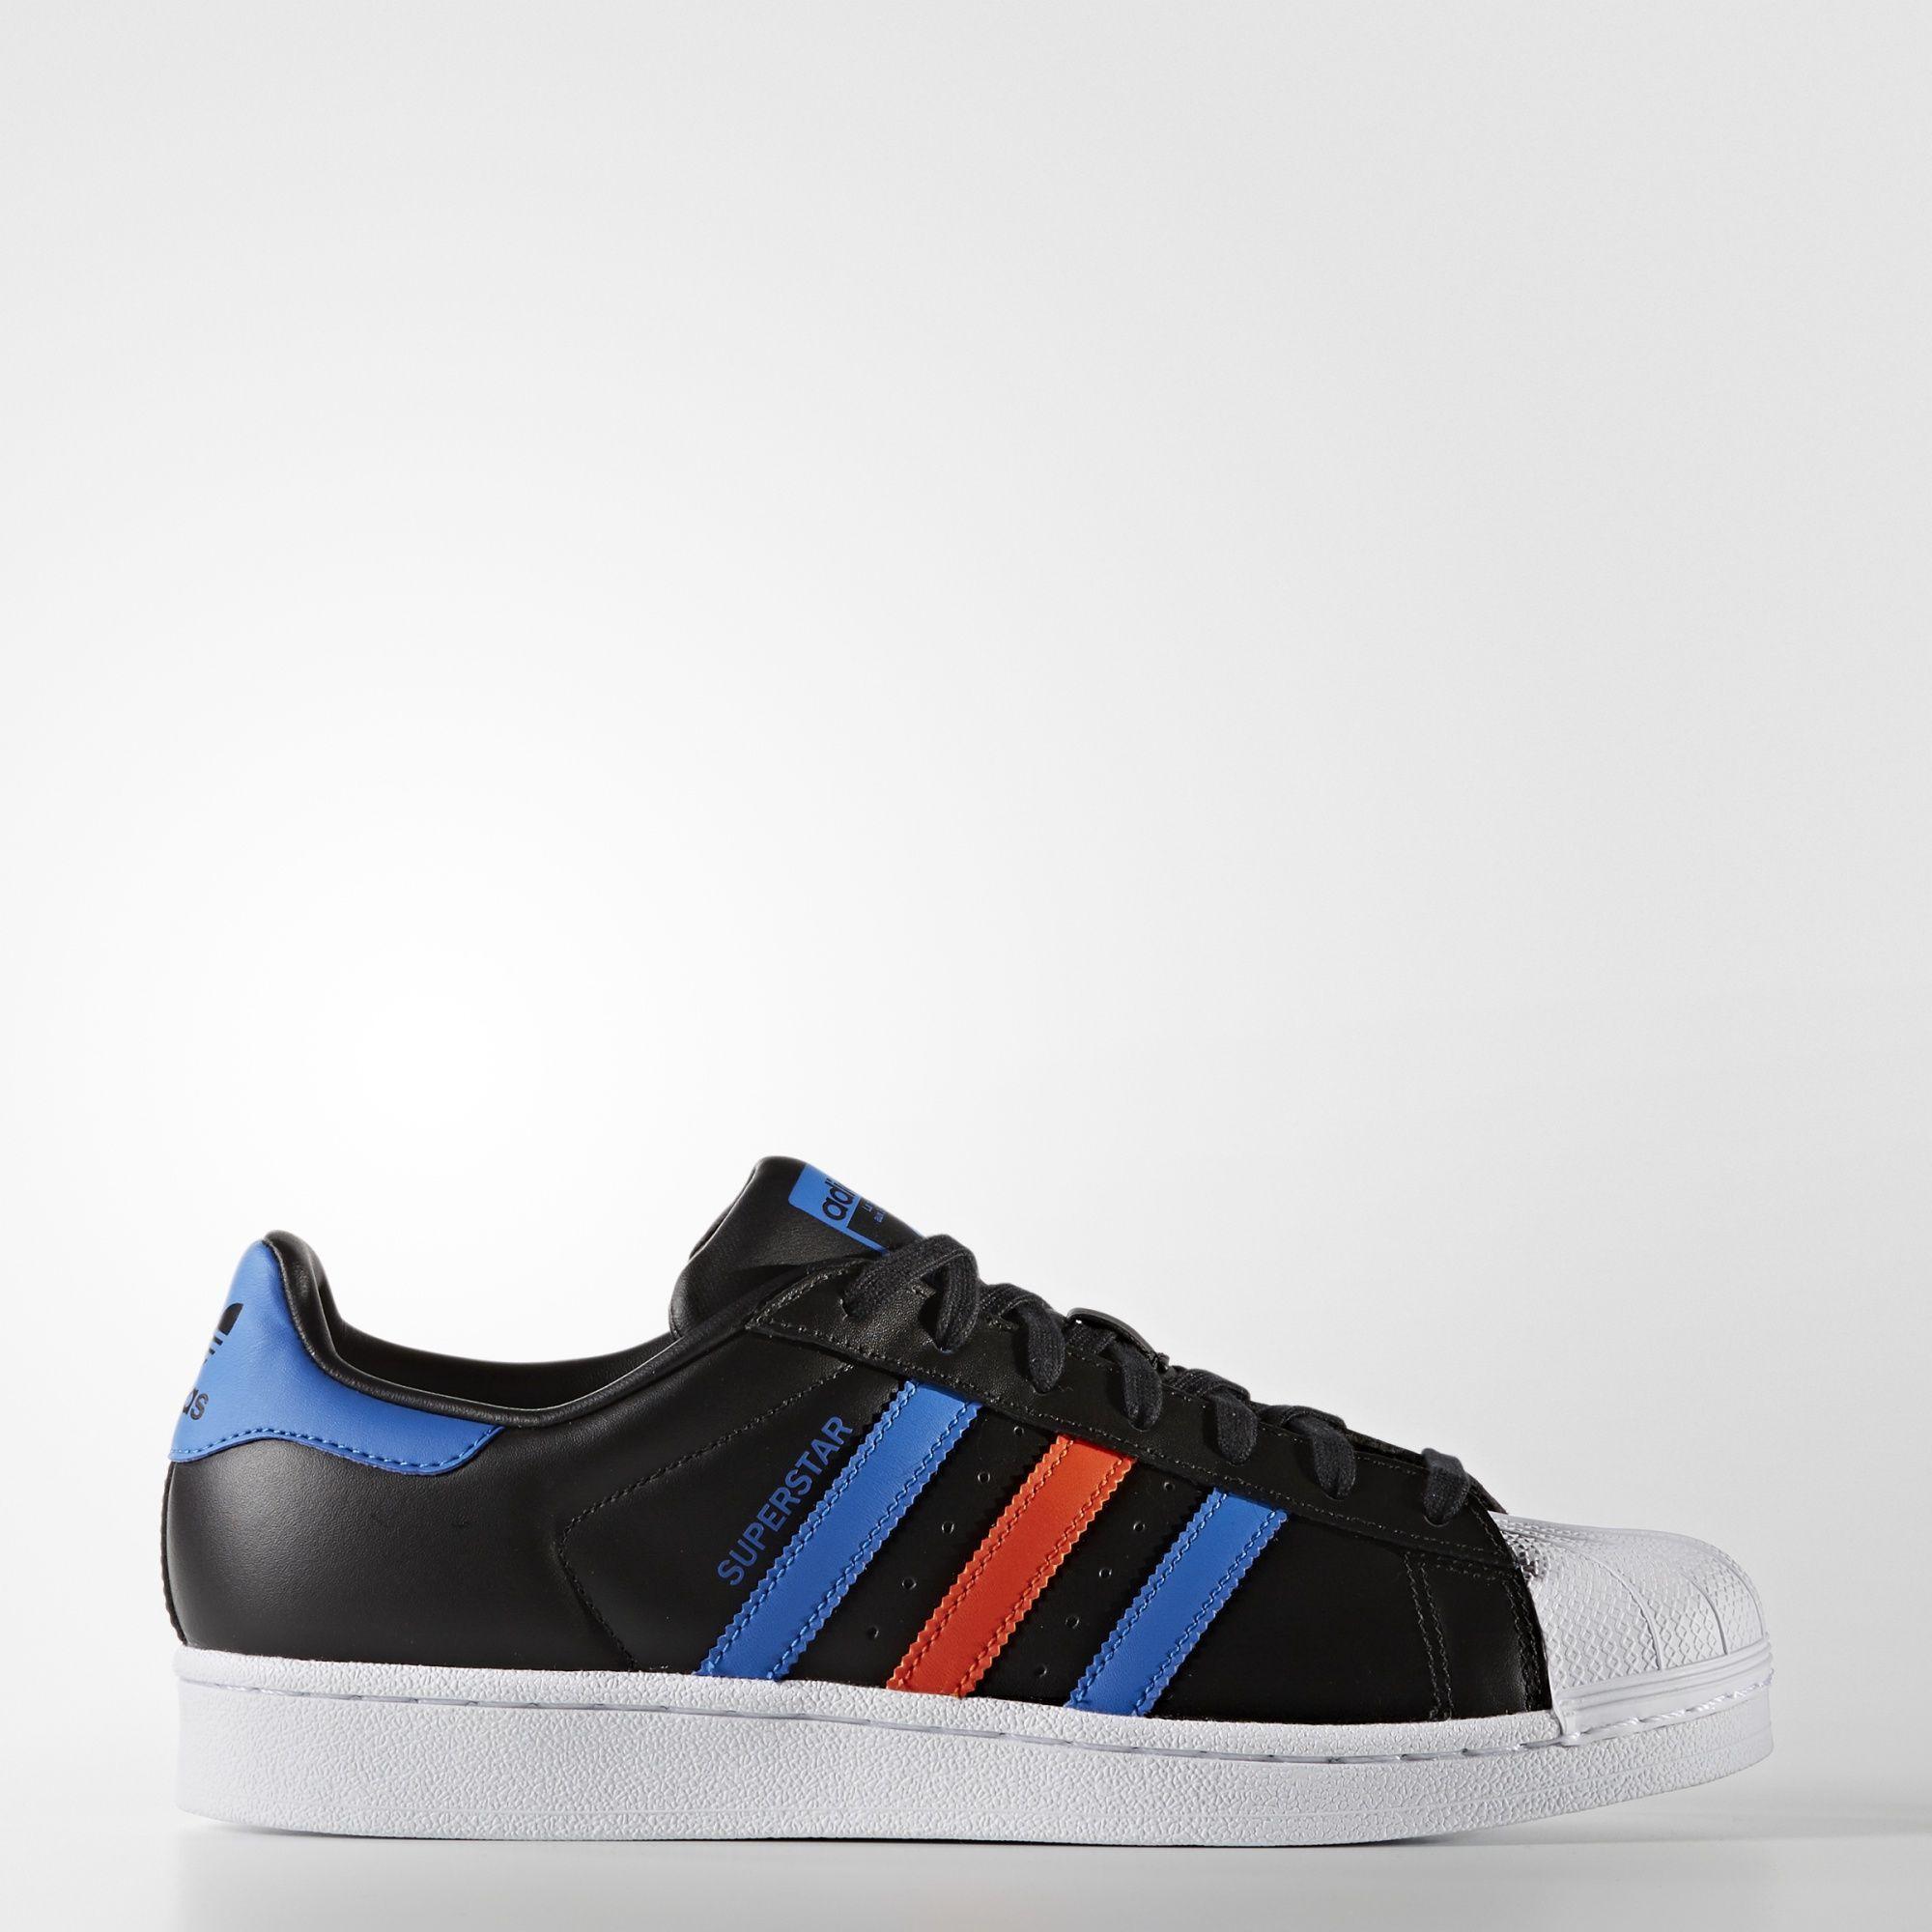 adidas - Zapatillas Originals SUPERSTAR   Chaussure adidas ...